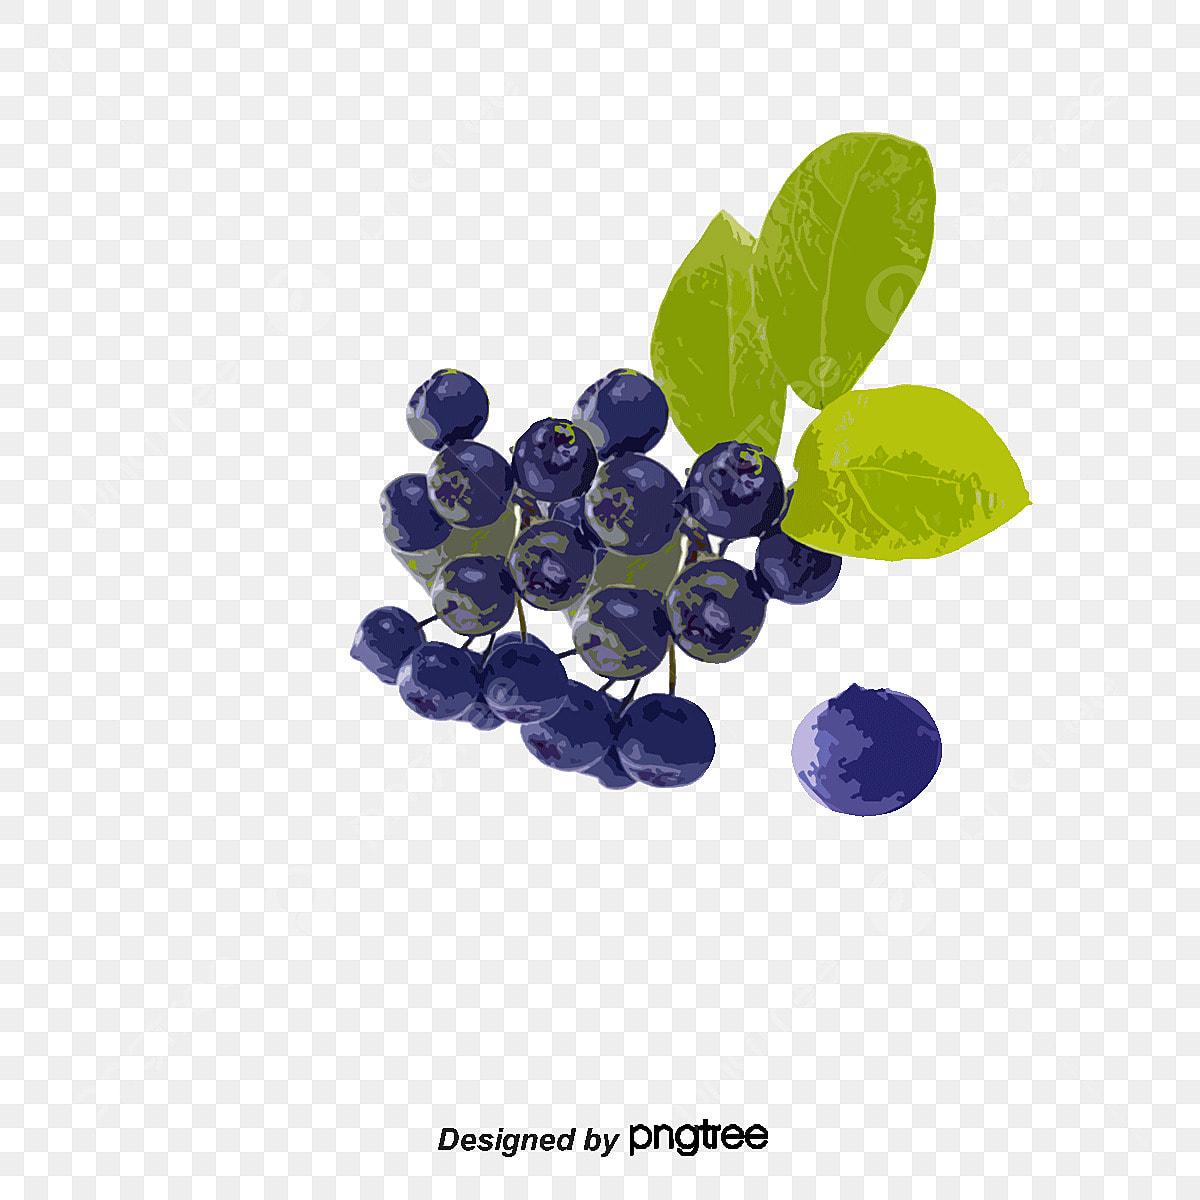 Desenhos De Frutas Vector Png Blueberry Torta De Frutas Png E